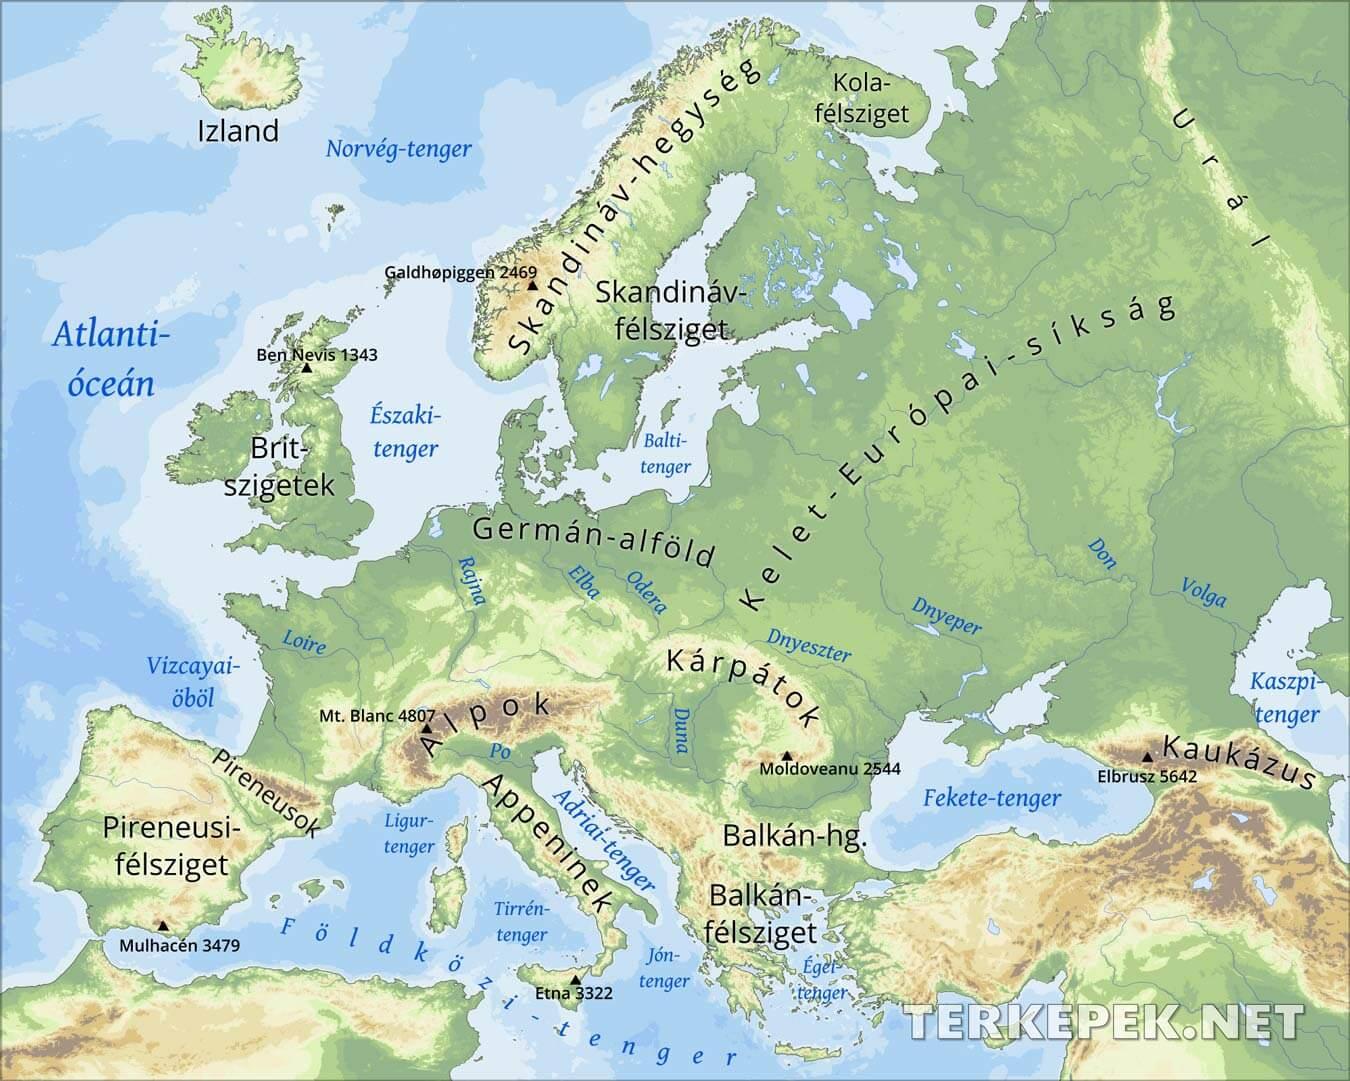 európa domborzati térkép Európa domborzati térképe európa domborzati térkép